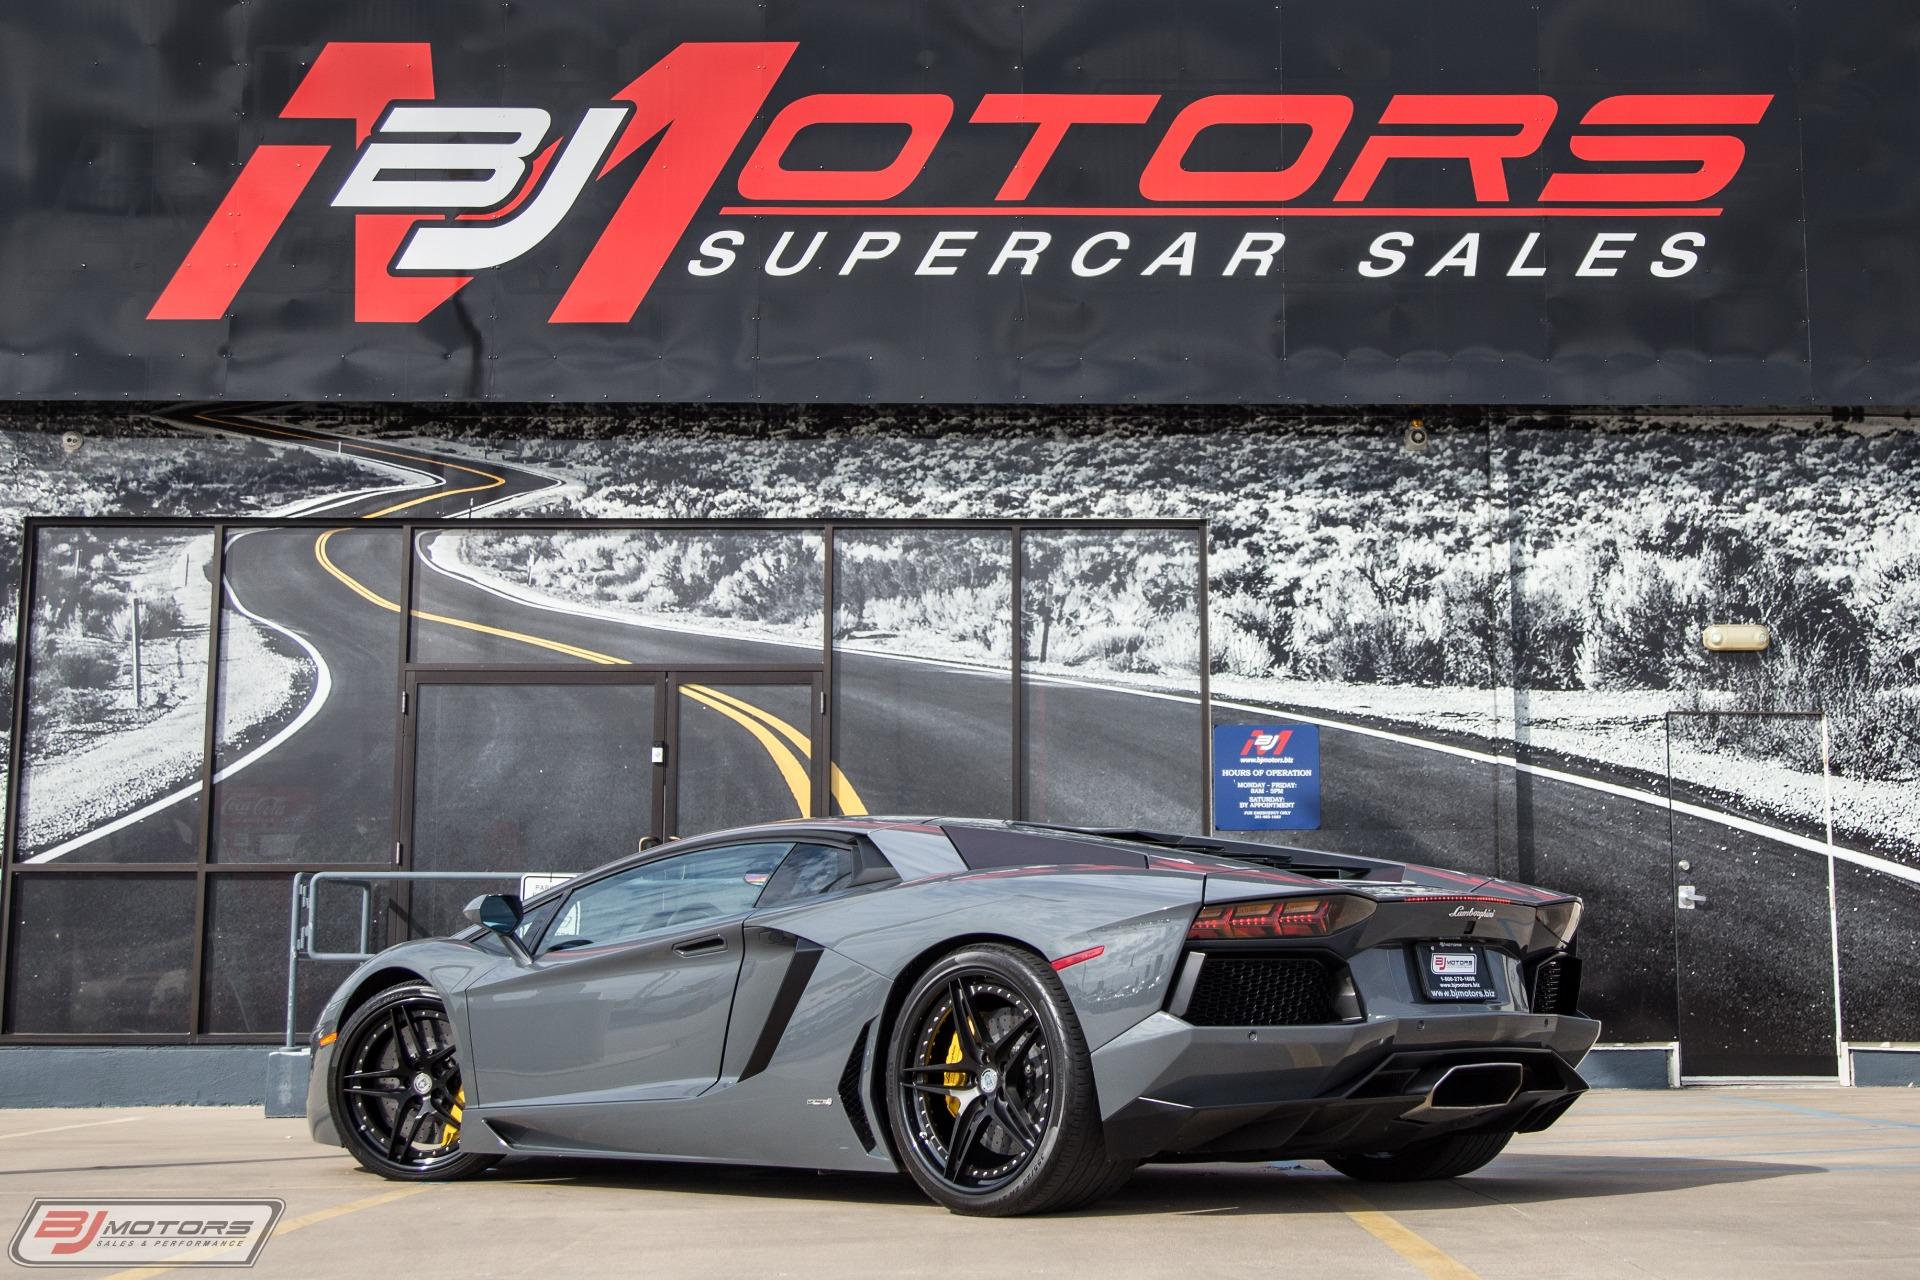 Used-2012-Lamborghini-Aventador-LP700-4-Underground-Racing-Twin-Turbo